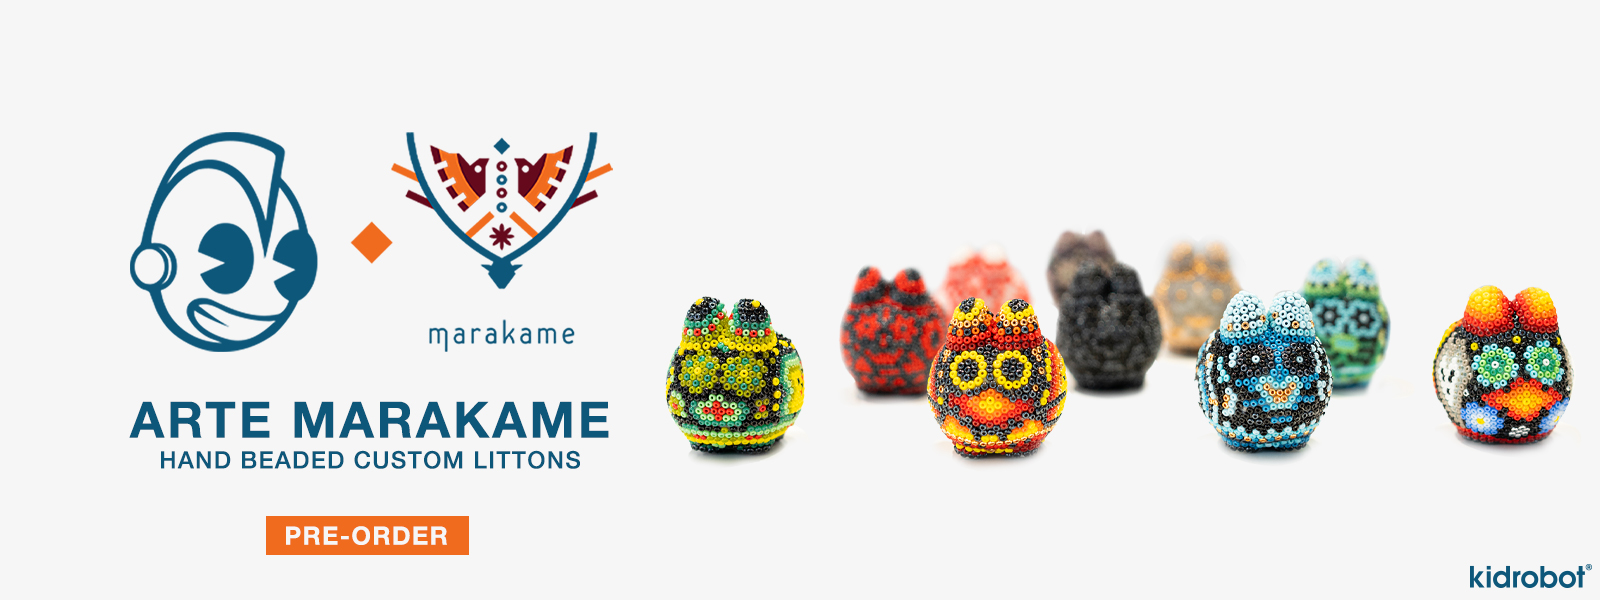 Arte Marakame Custom Beaded Litton Labbit Art Figures